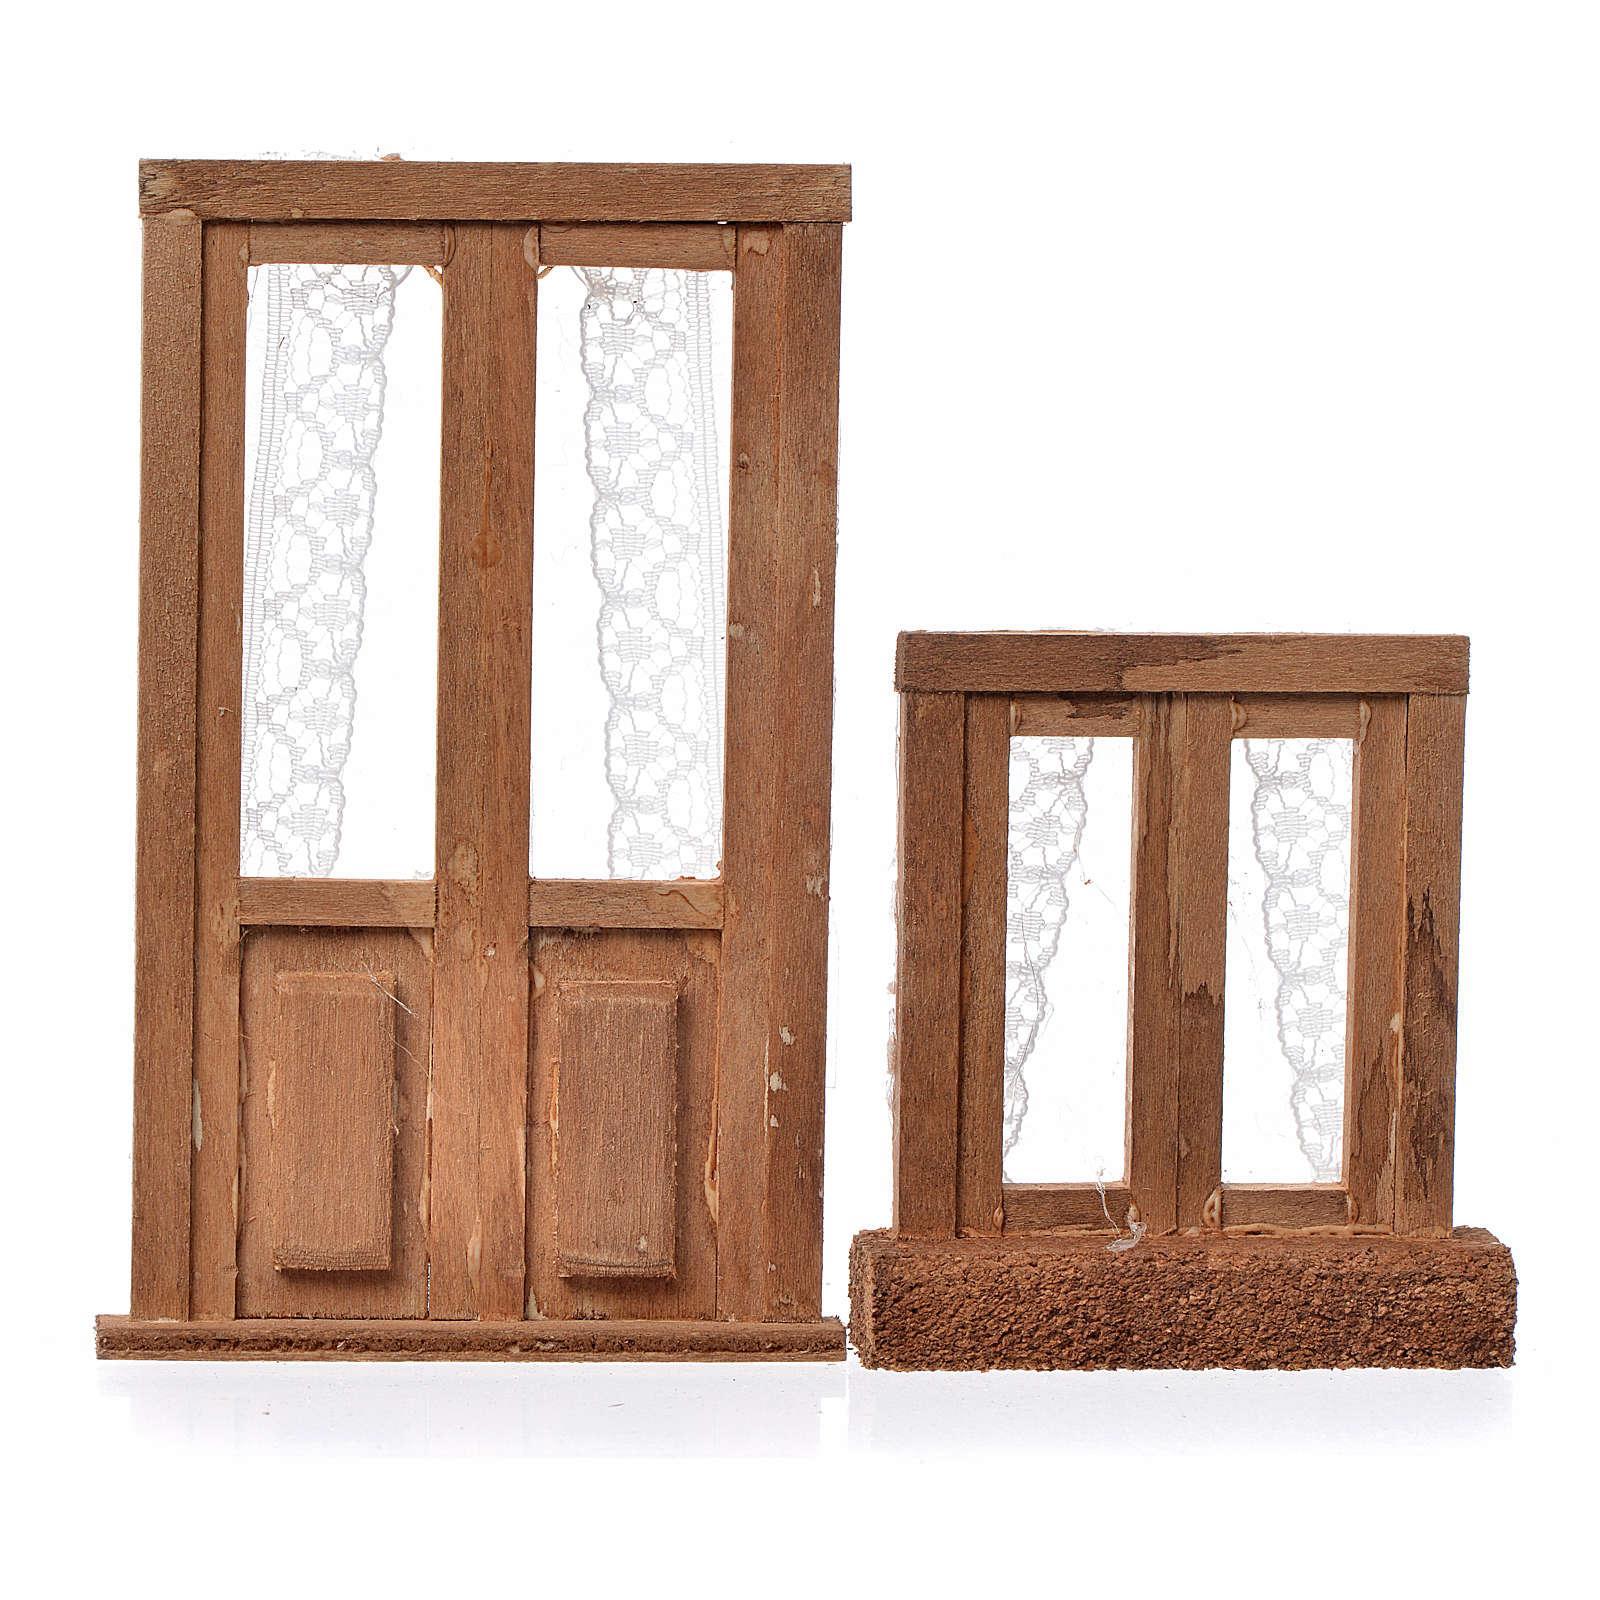 Nativity accessory, wooden frames, 2 pcs, 11x7 and 7x6cm 4